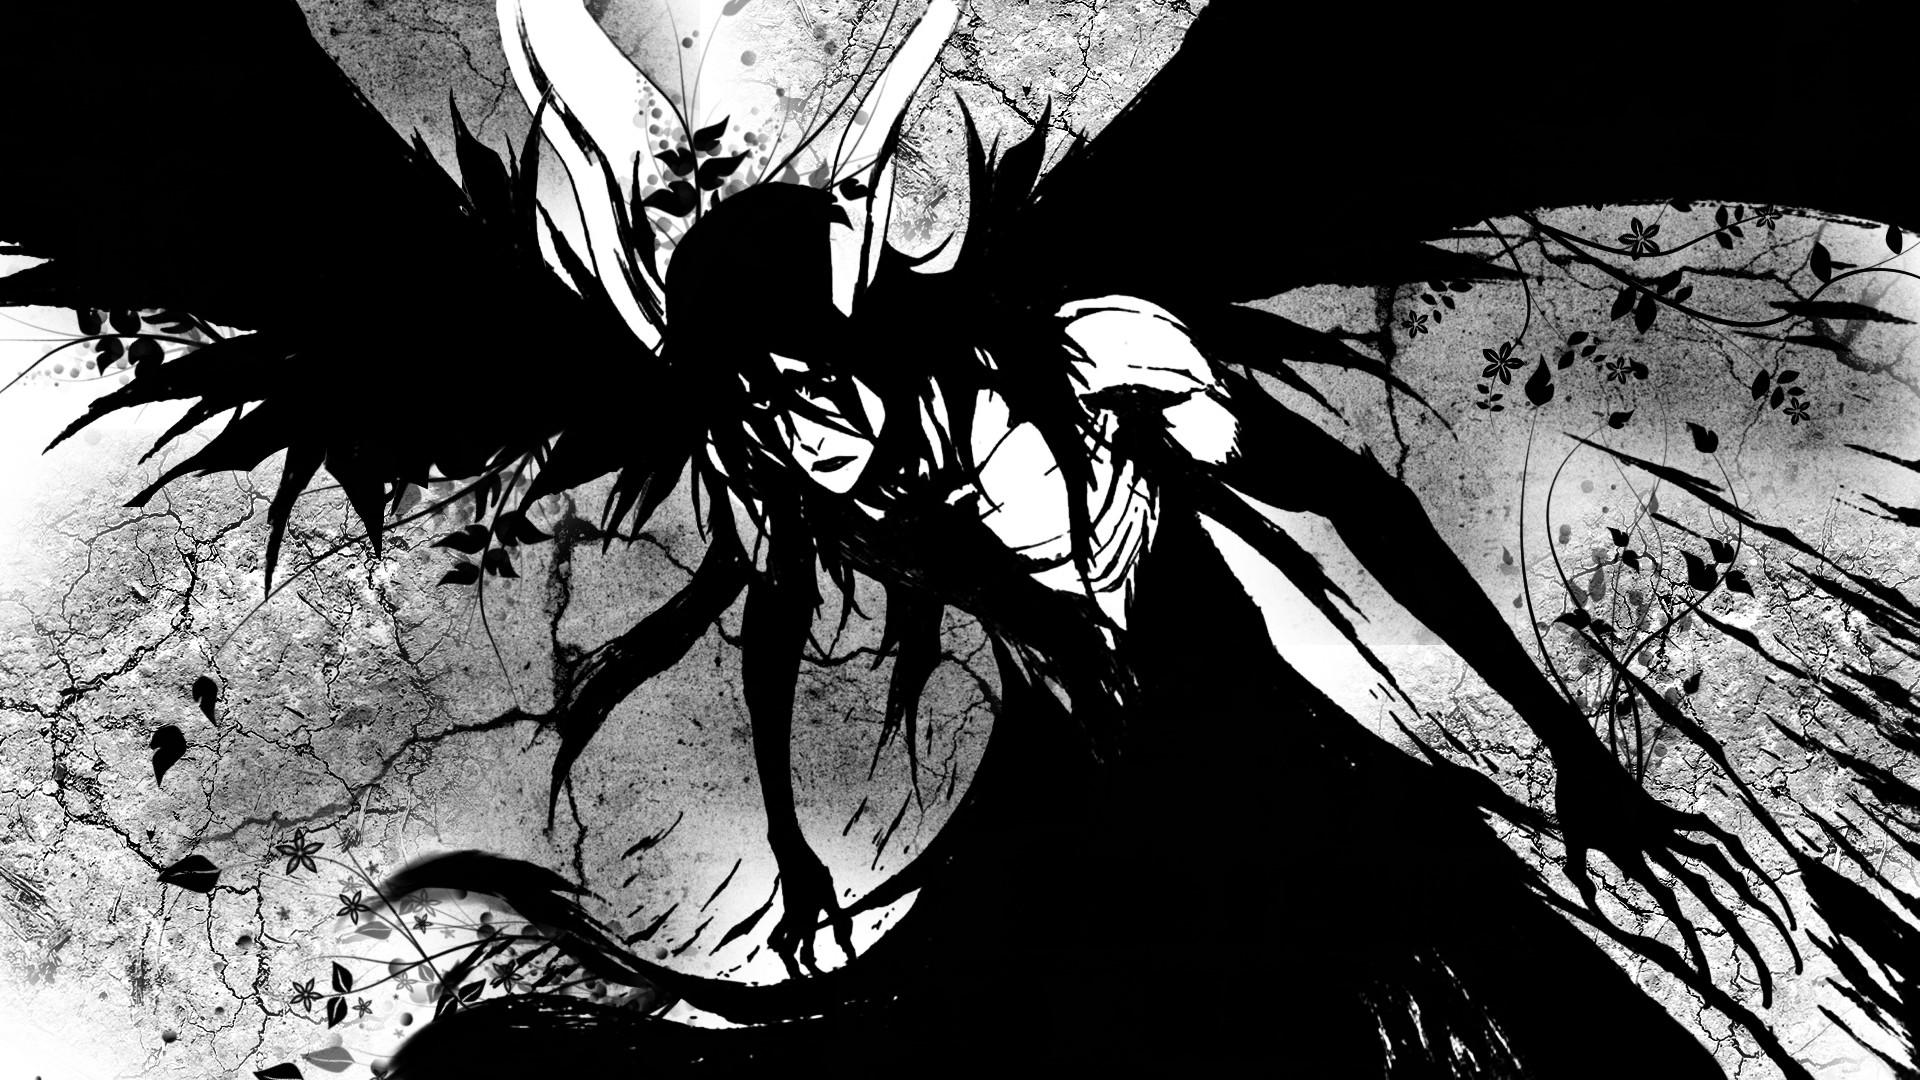 1920x1080 Bleach Espada Wallpapers Images